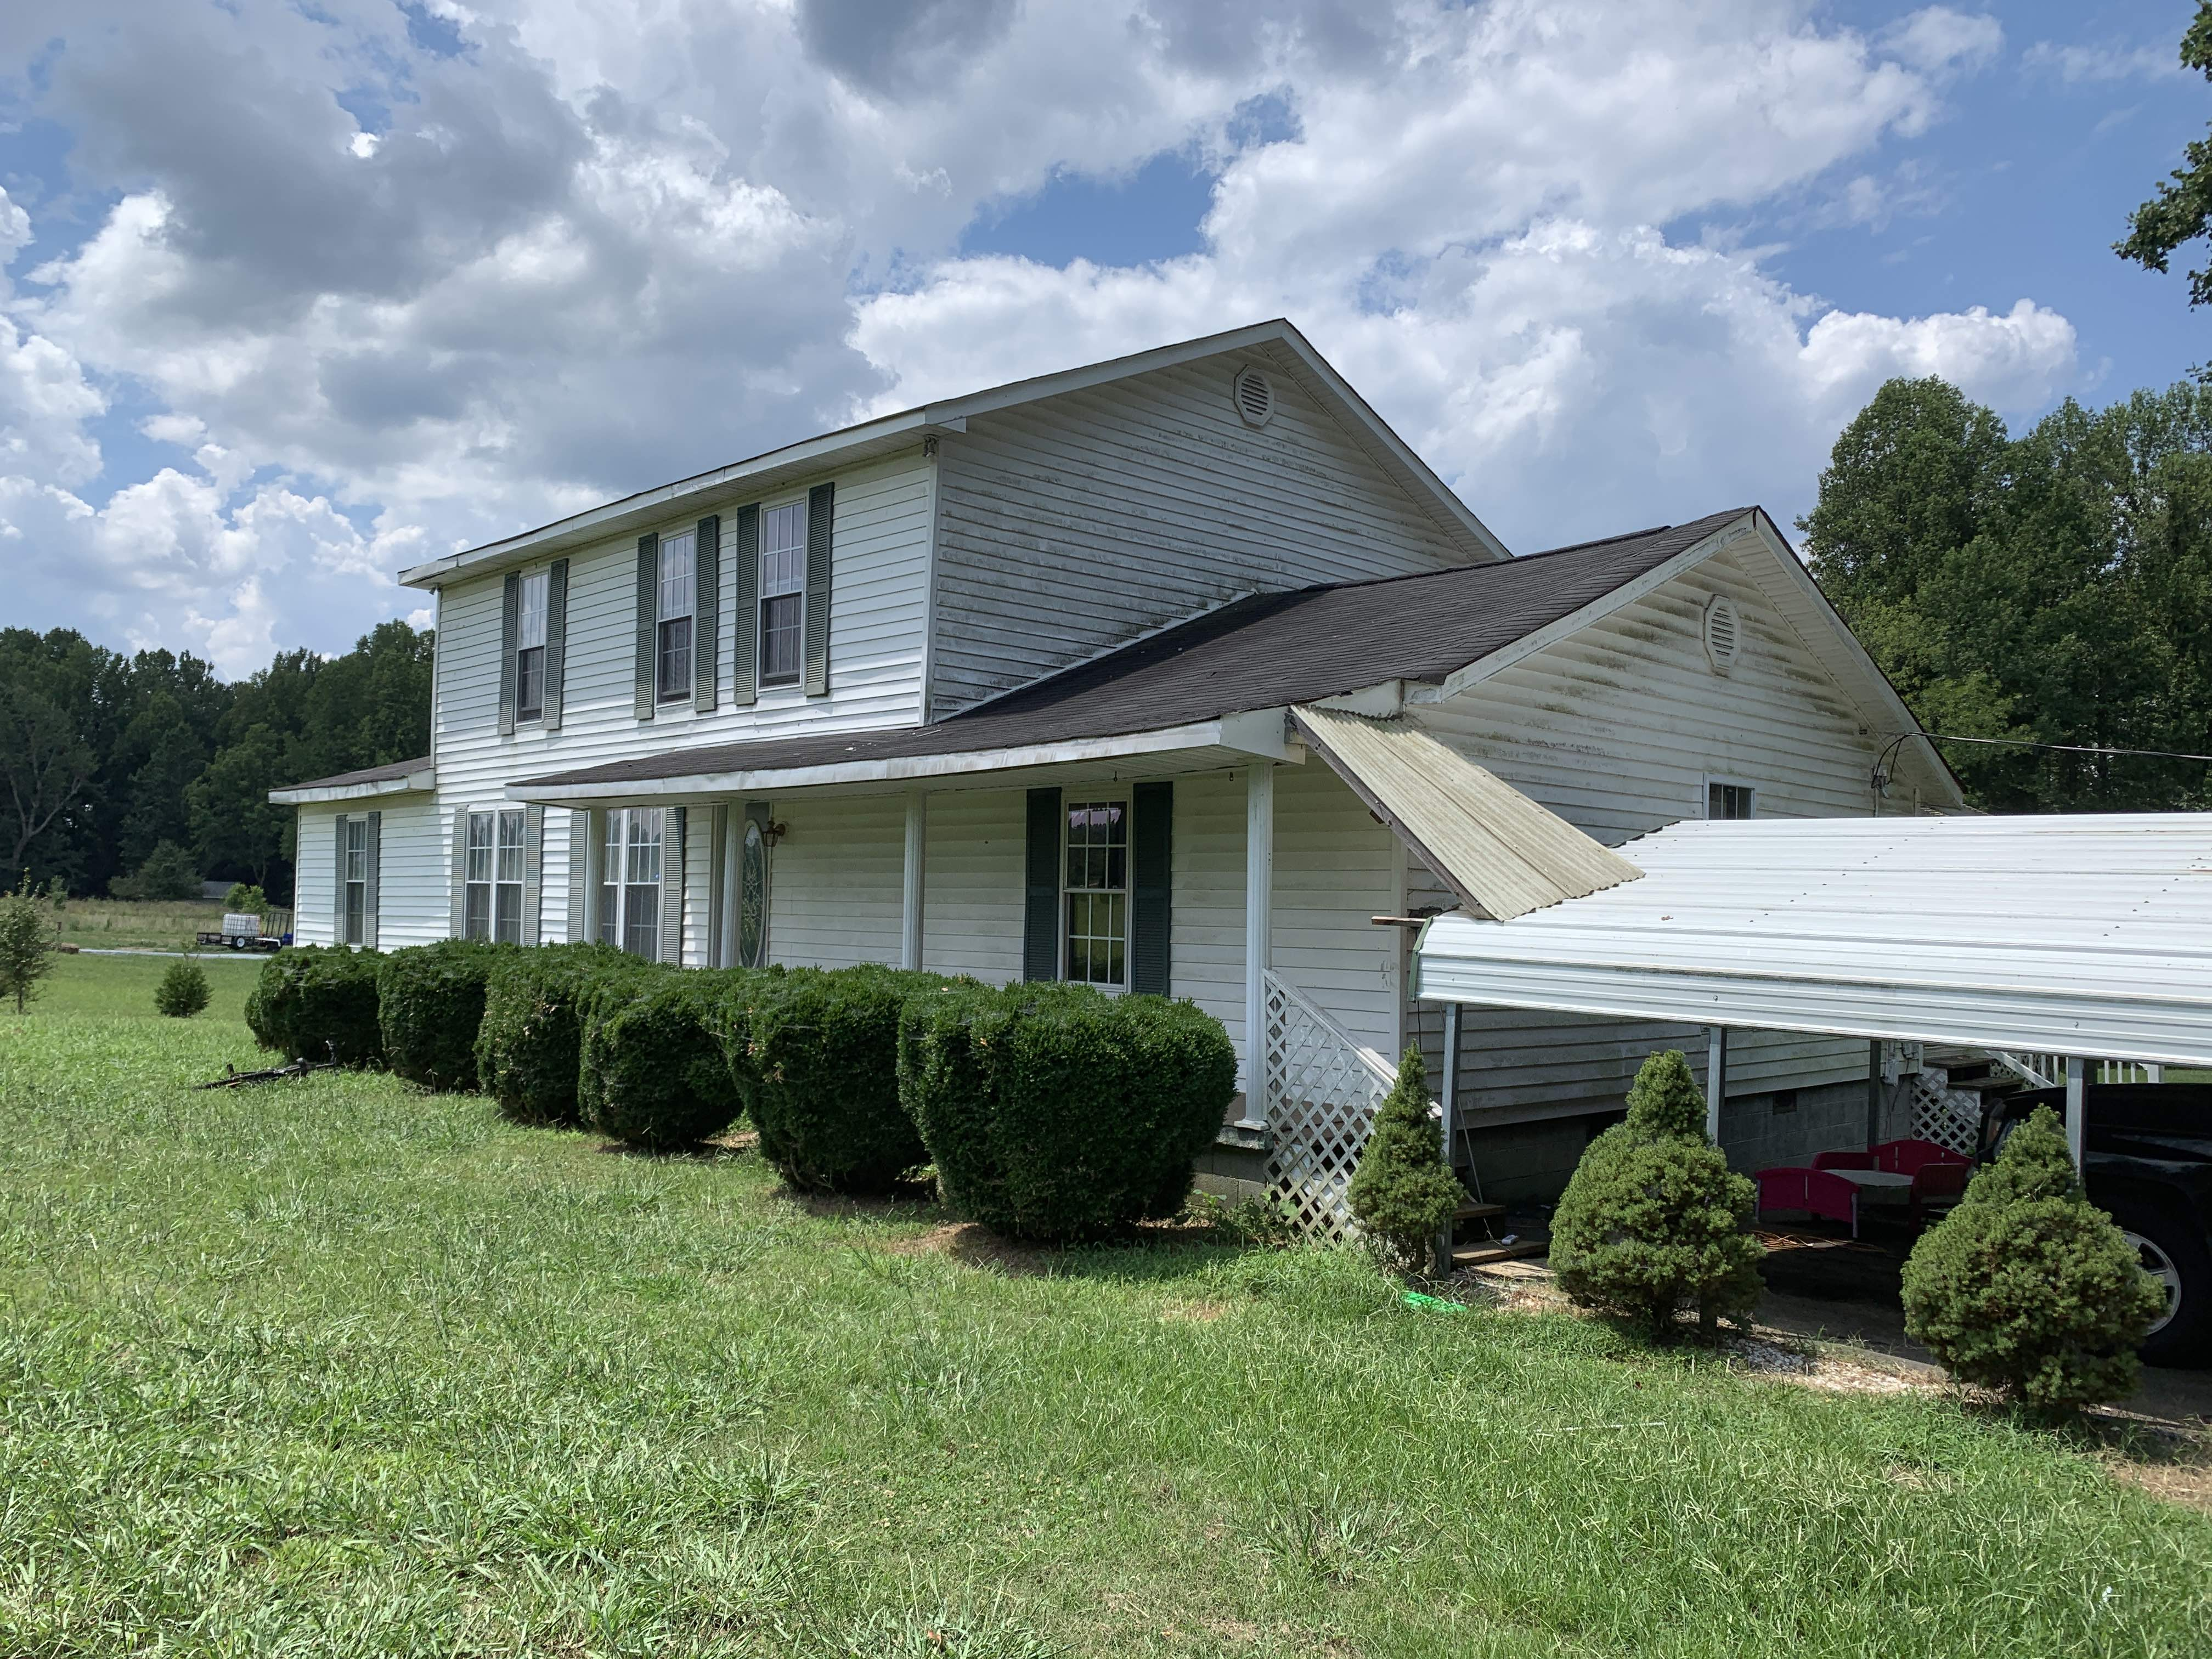 4020 Efland - Cedar Grove Rd, Hillsborough, NC